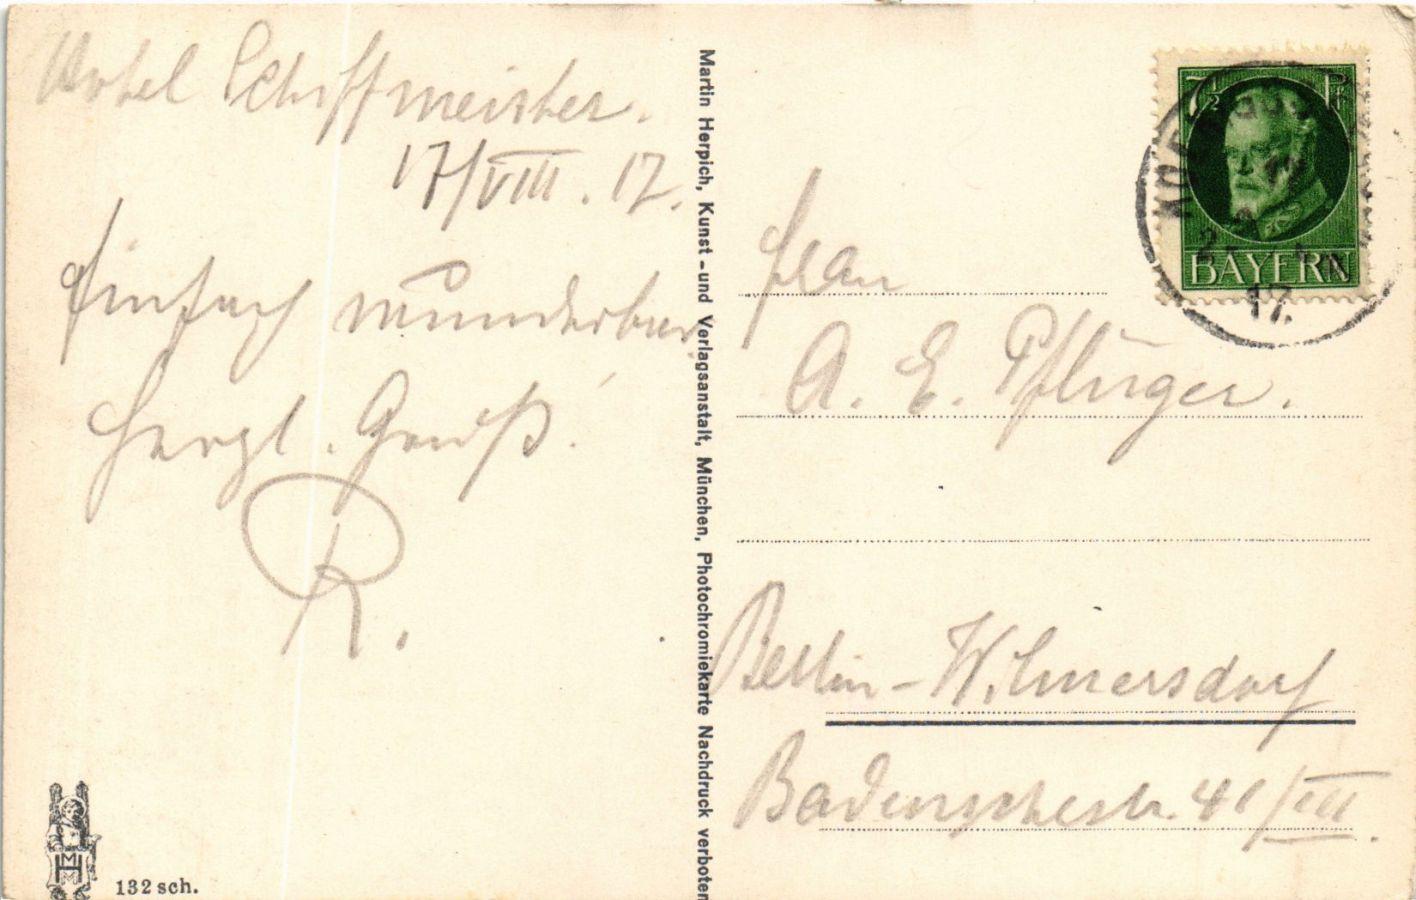 CPA-AK-Konigssee-vom-Malerwinkel-GERMANY-878784 miniature 2